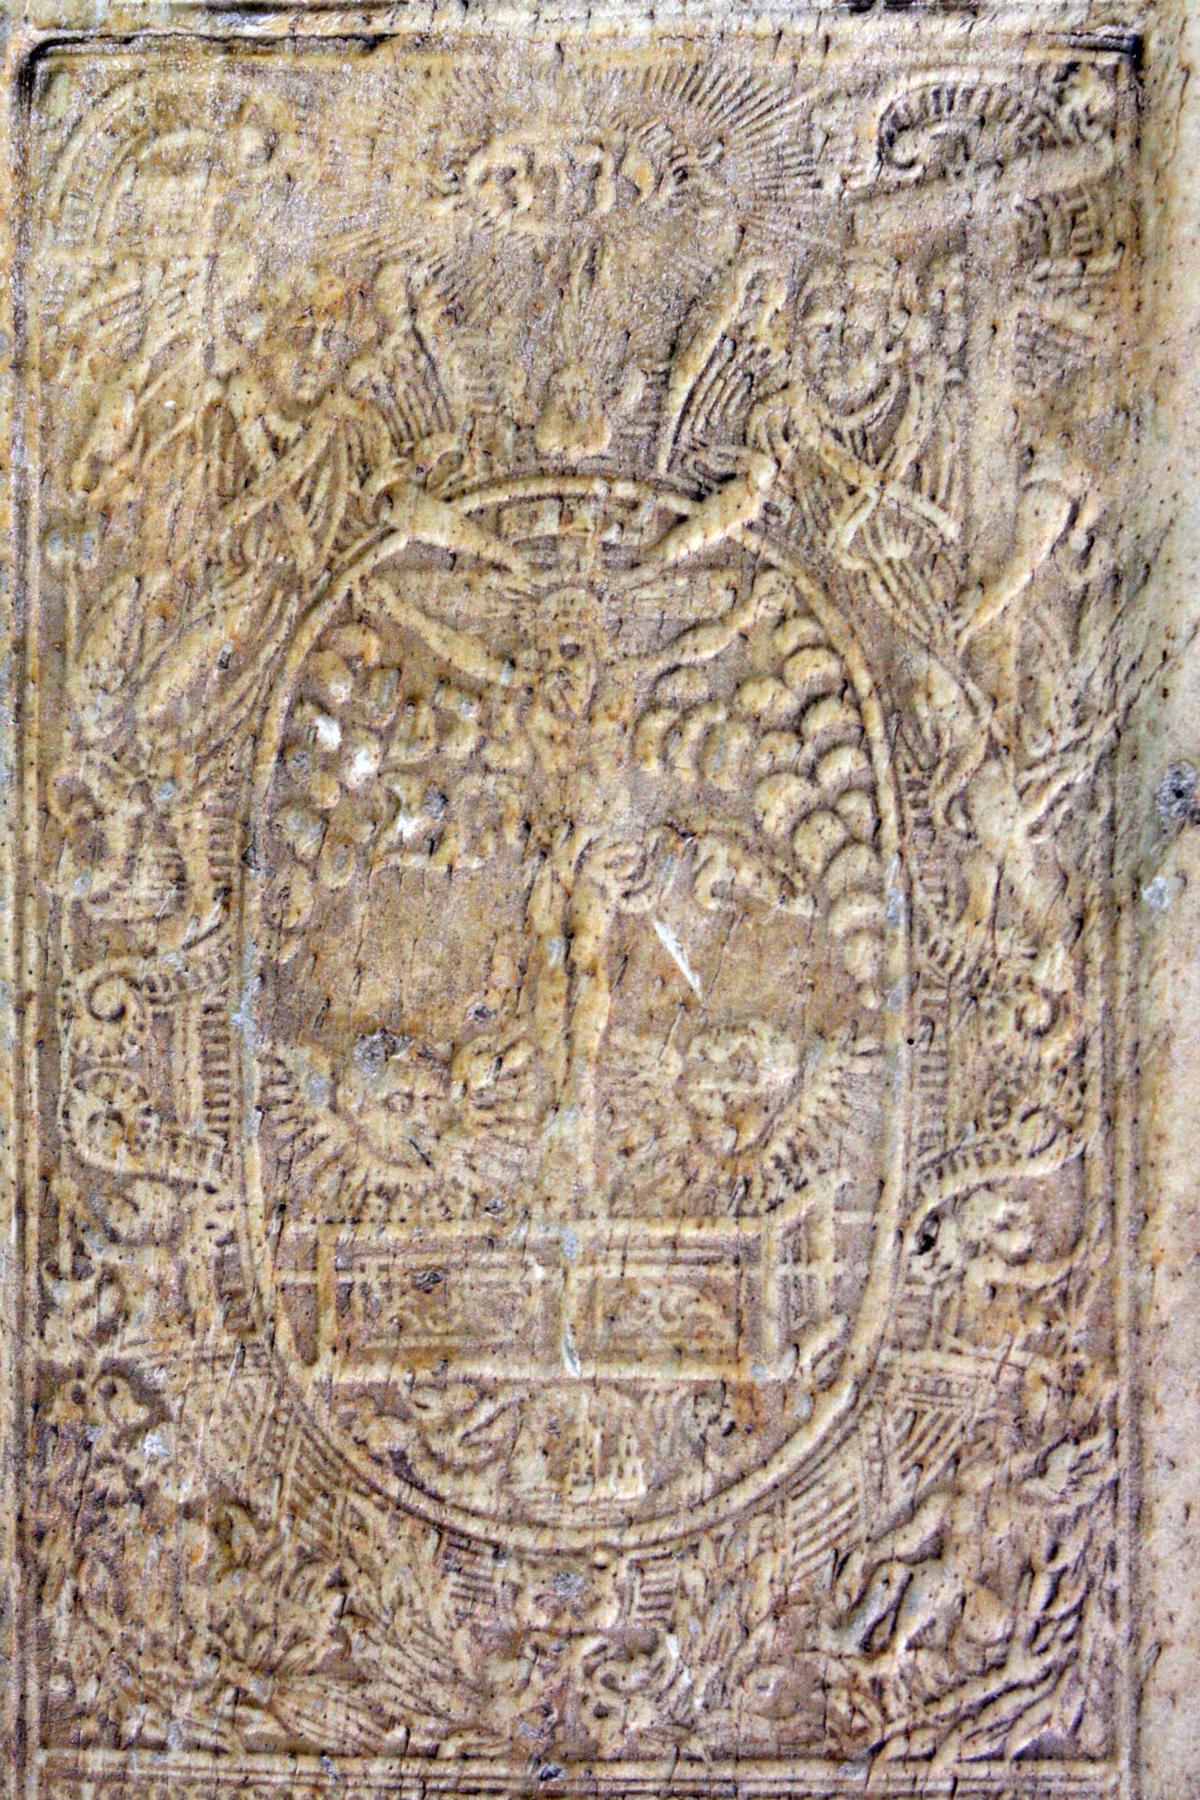 Griechische-Lateinische Bibel, Novum Testamentum 1582-3